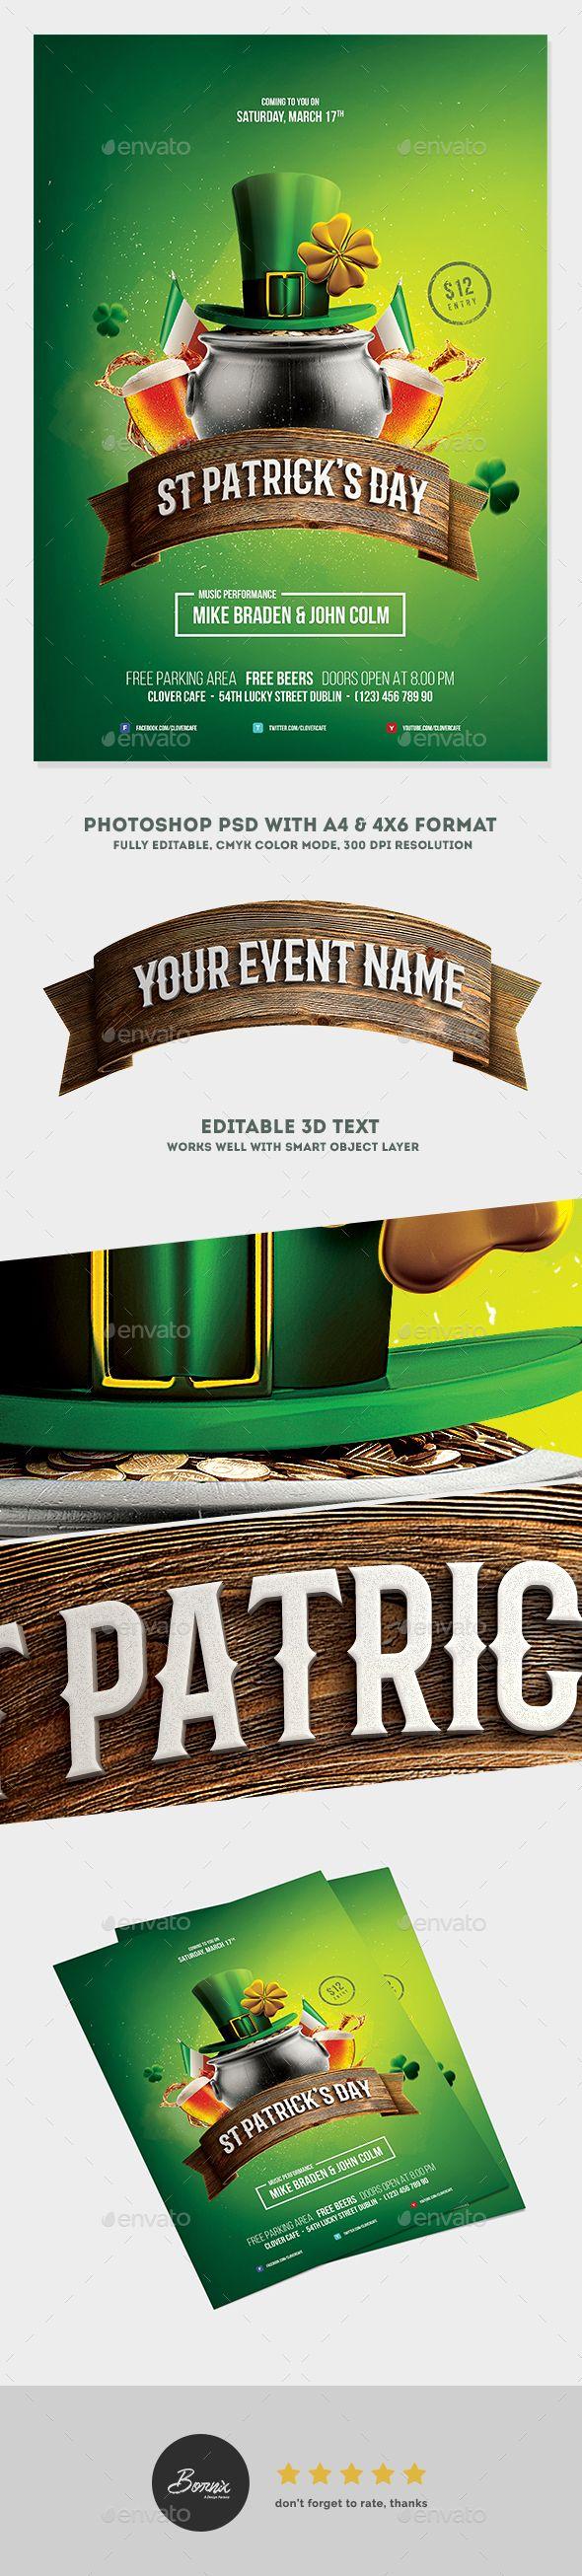 Saint Patricks Day Party Flyer — Photoshop PSD #psd #poster • Download ➝ https://graphicriver.net/item/saint-patricks-day-party-flyer/19514731?ref=pxcr